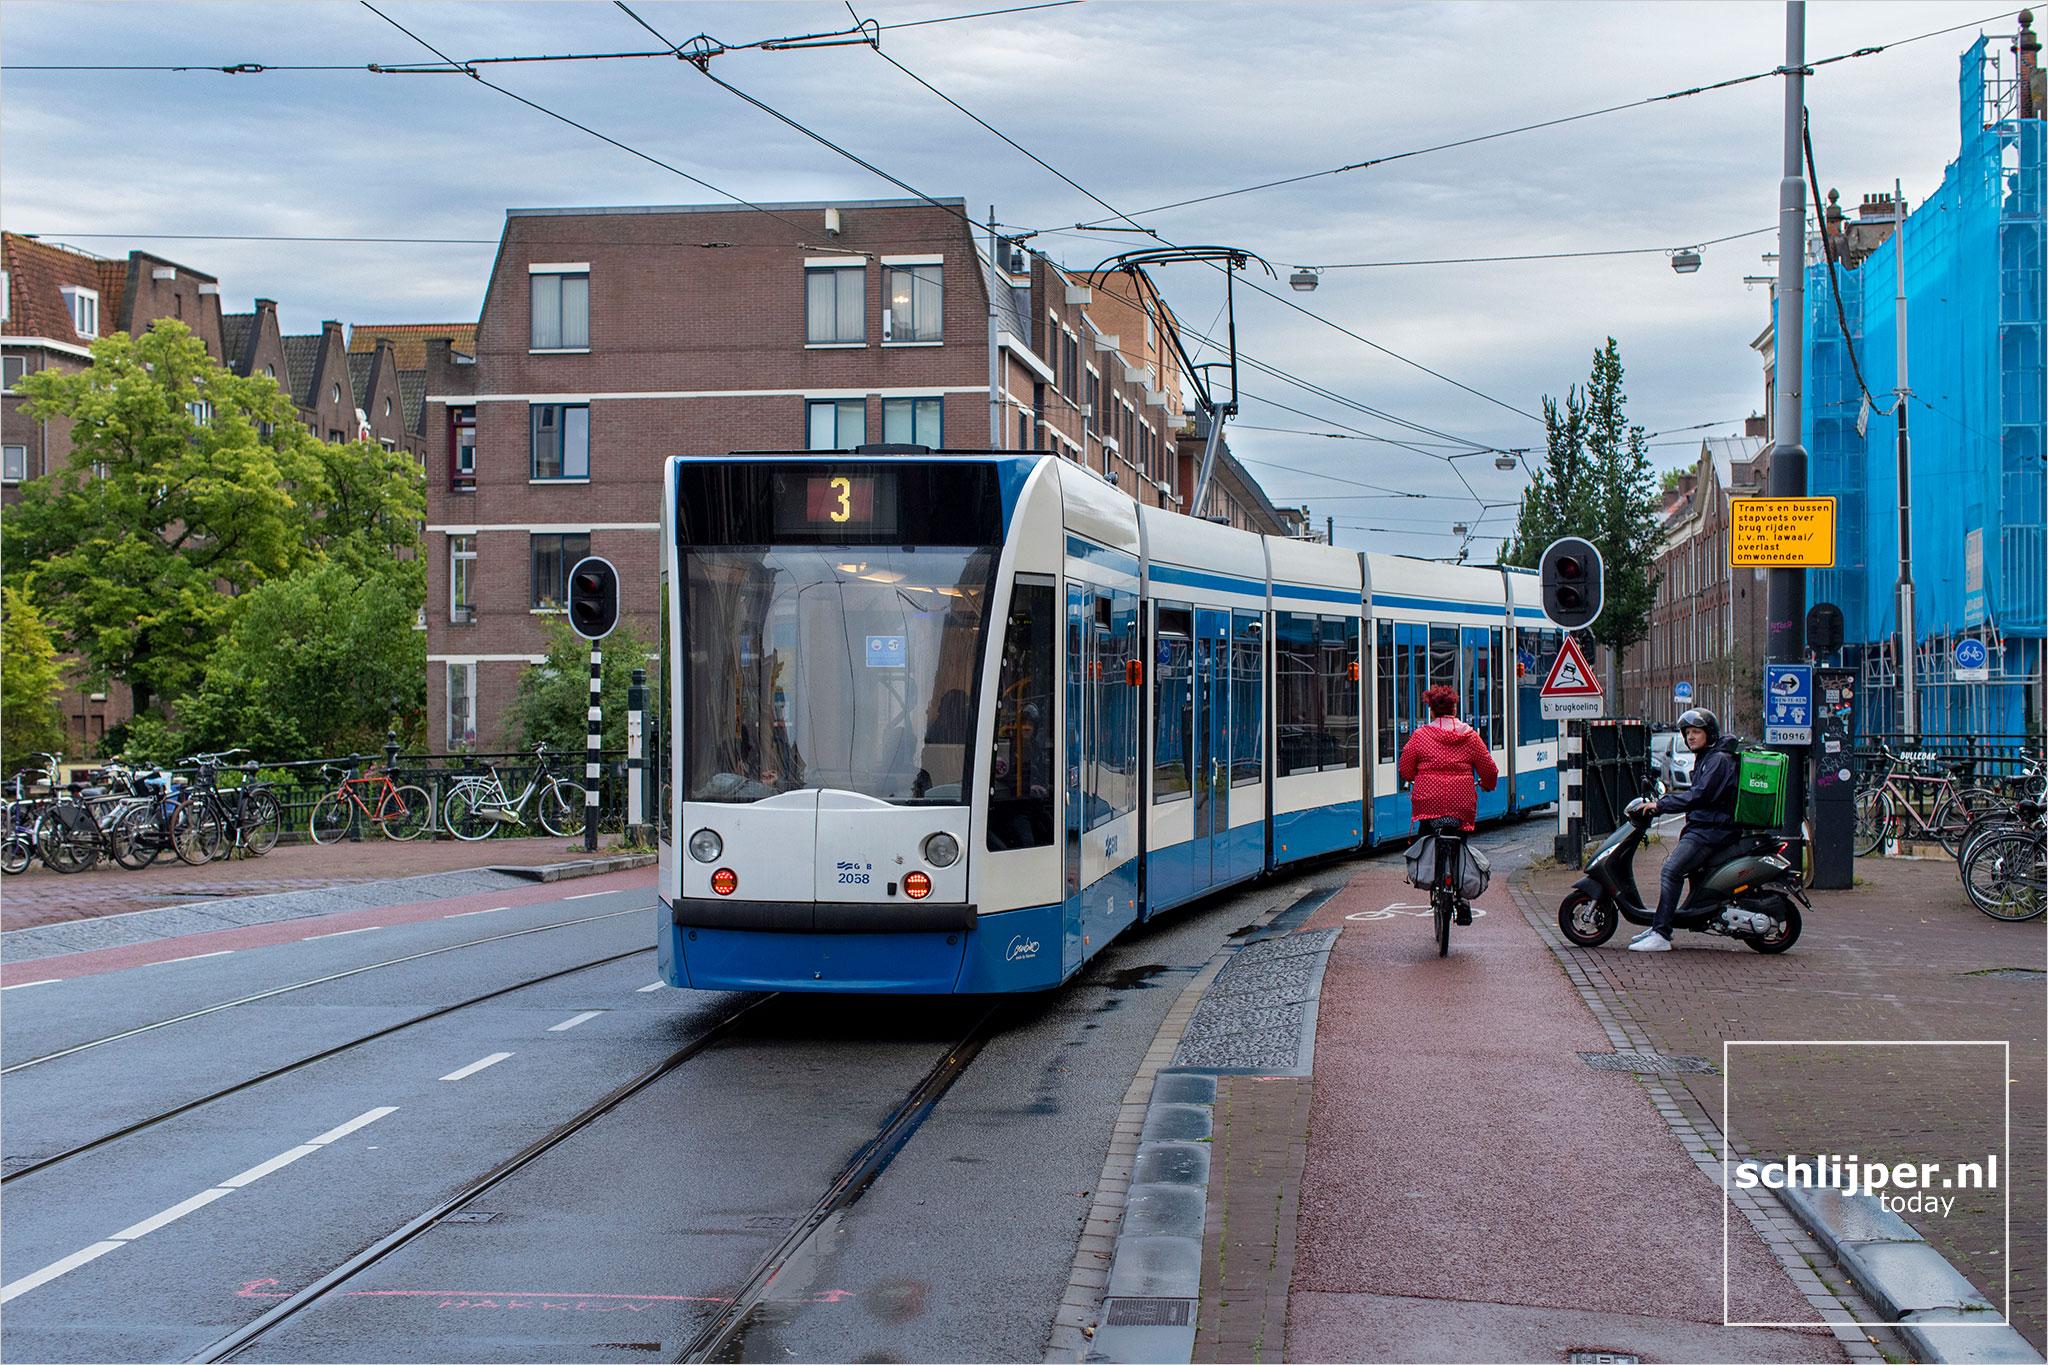 Nederland, Amsterdam, 27 juli 2020